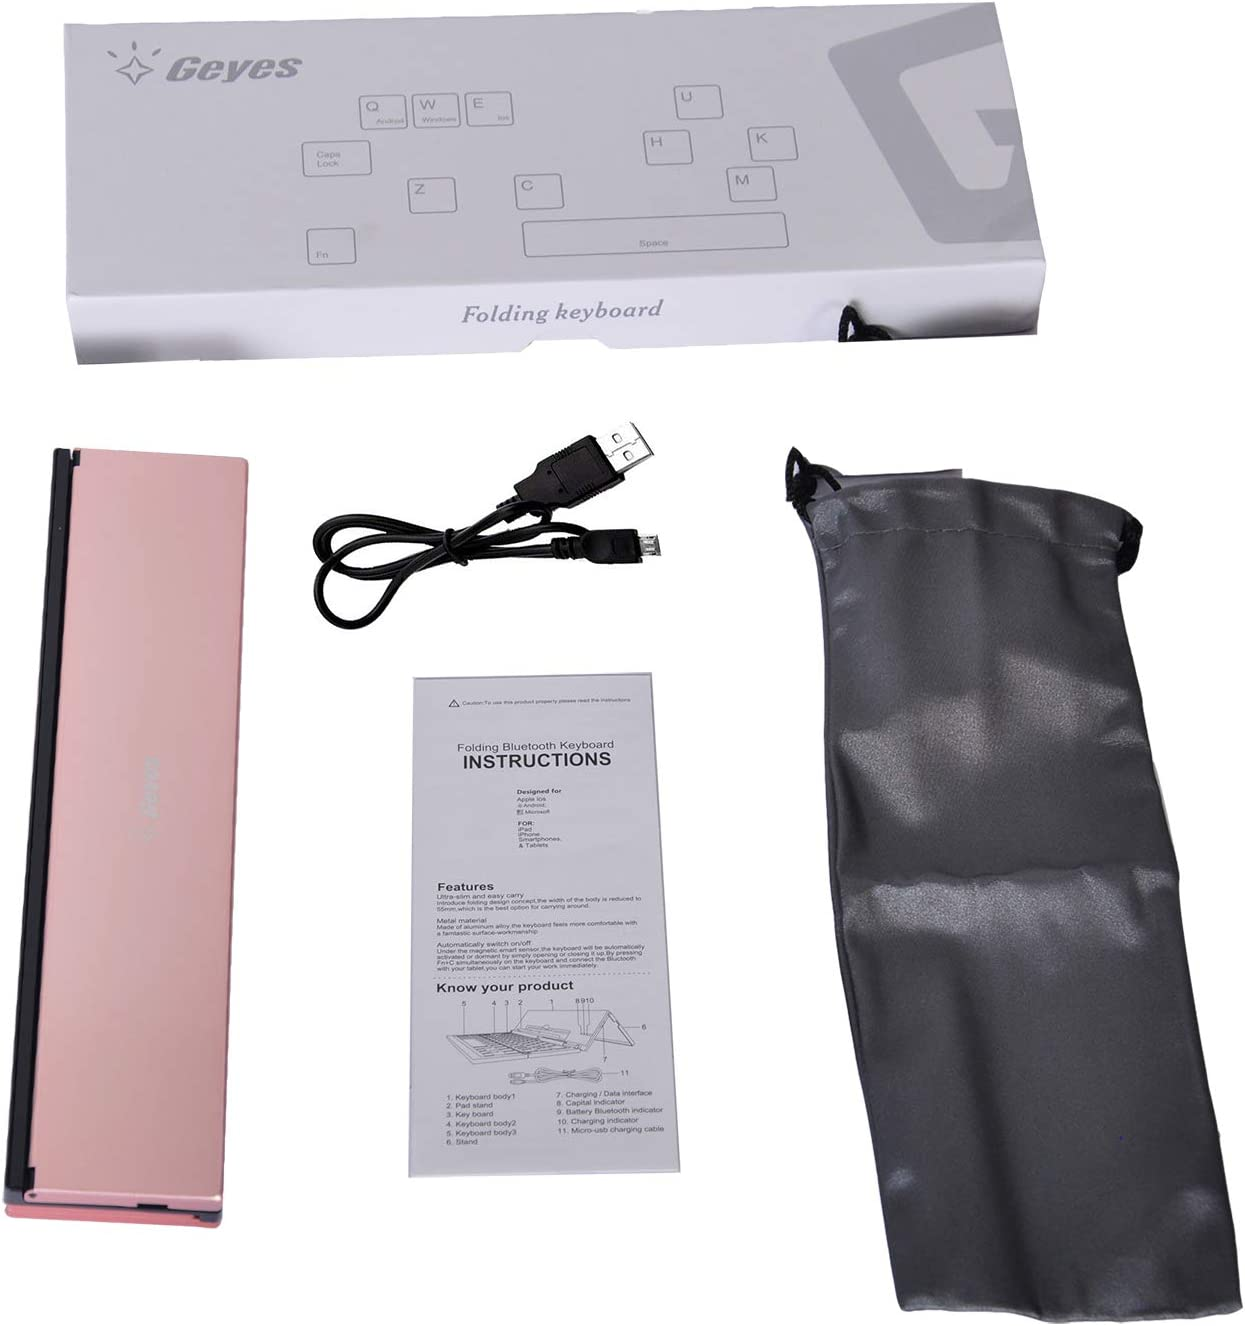 ghdonat.com Samsung Android Tablet Smart Phone Folding Bluetooth ...